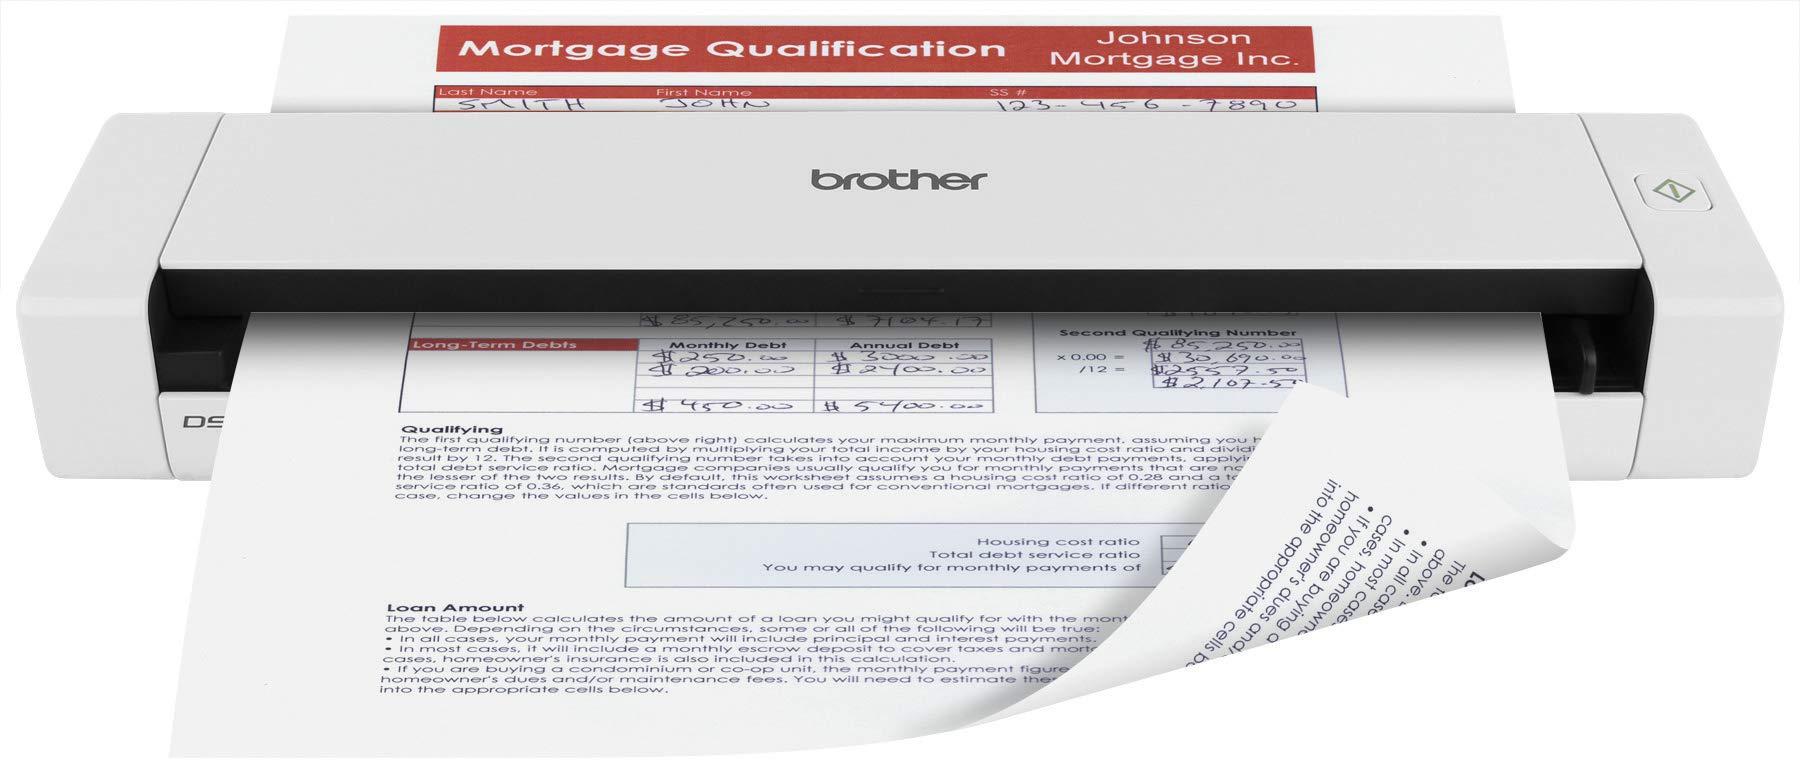 Brother Scanner DS 720D Scanning Lightweight